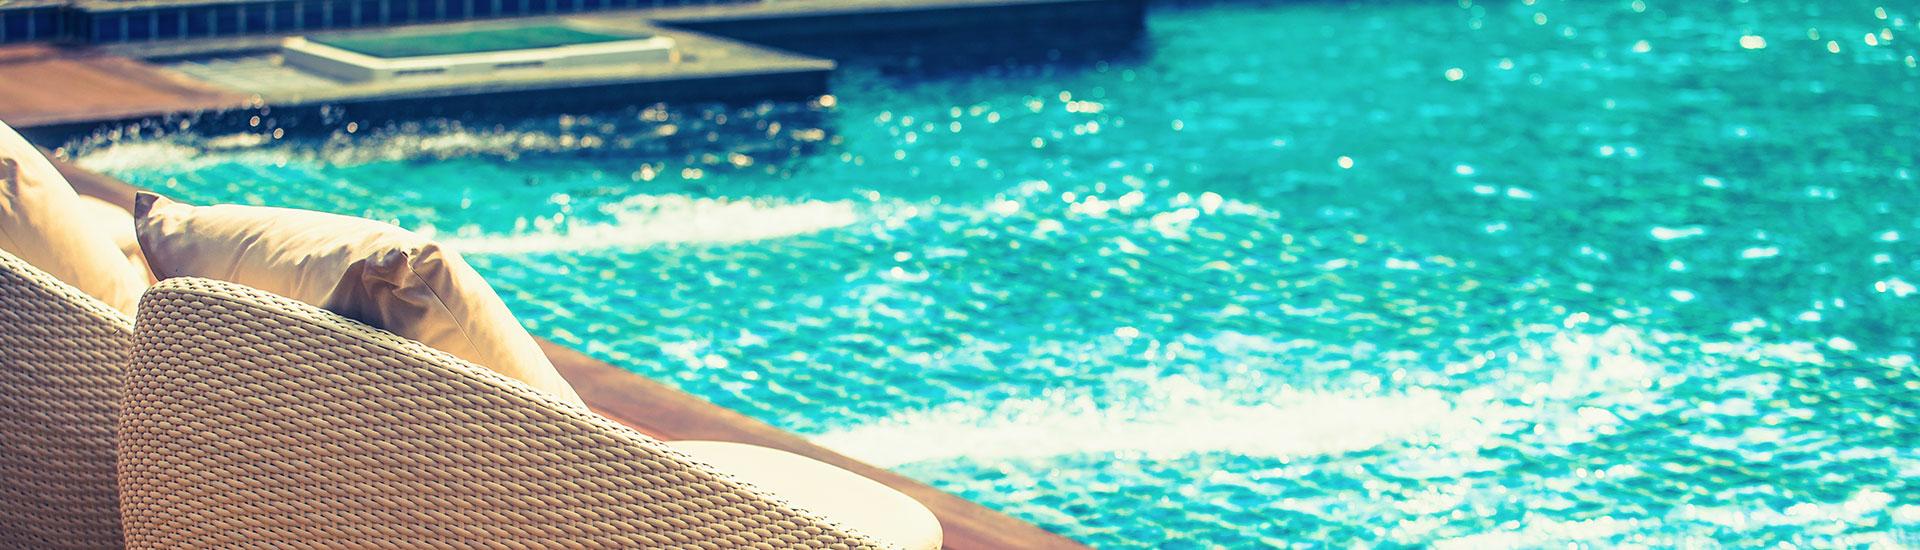 entretien piscine hiver with entretien piscine hiver produits duhivernage waterblue pour. Black Bedroom Furniture Sets. Home Design Ideas